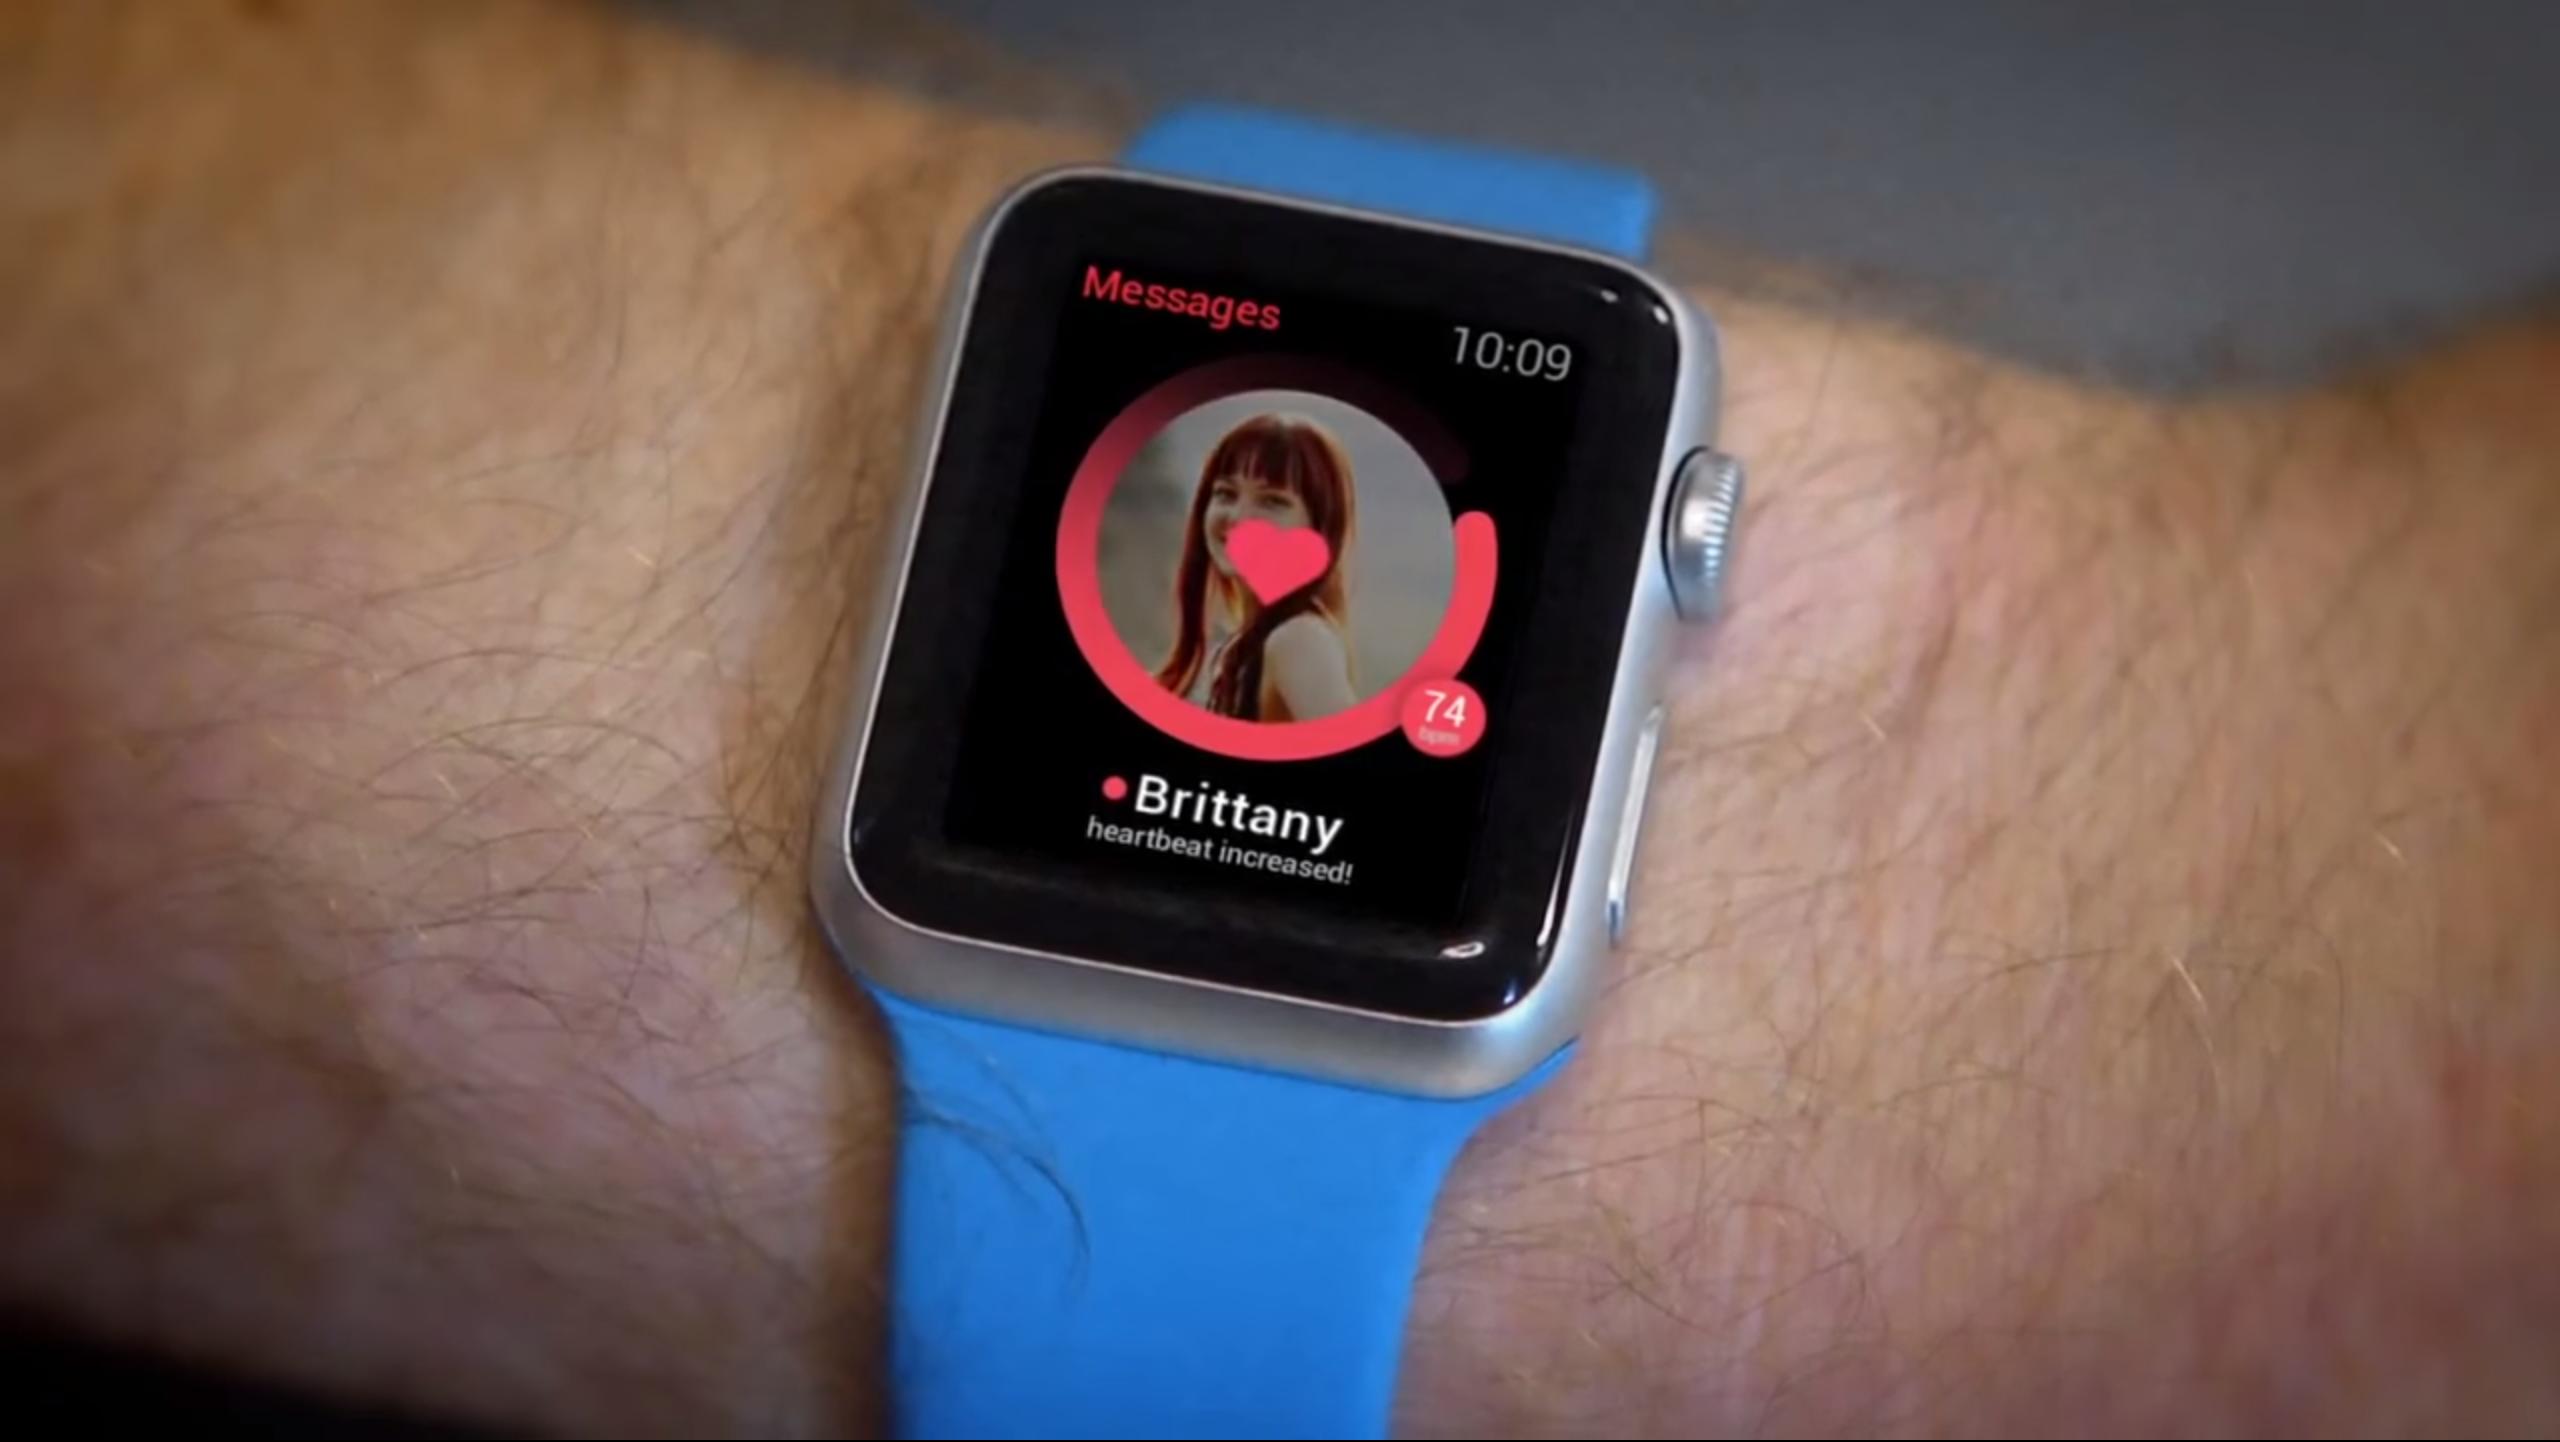 Ingenious Apple Watch Hack Lets Your Heart Swipe Right - Global ...